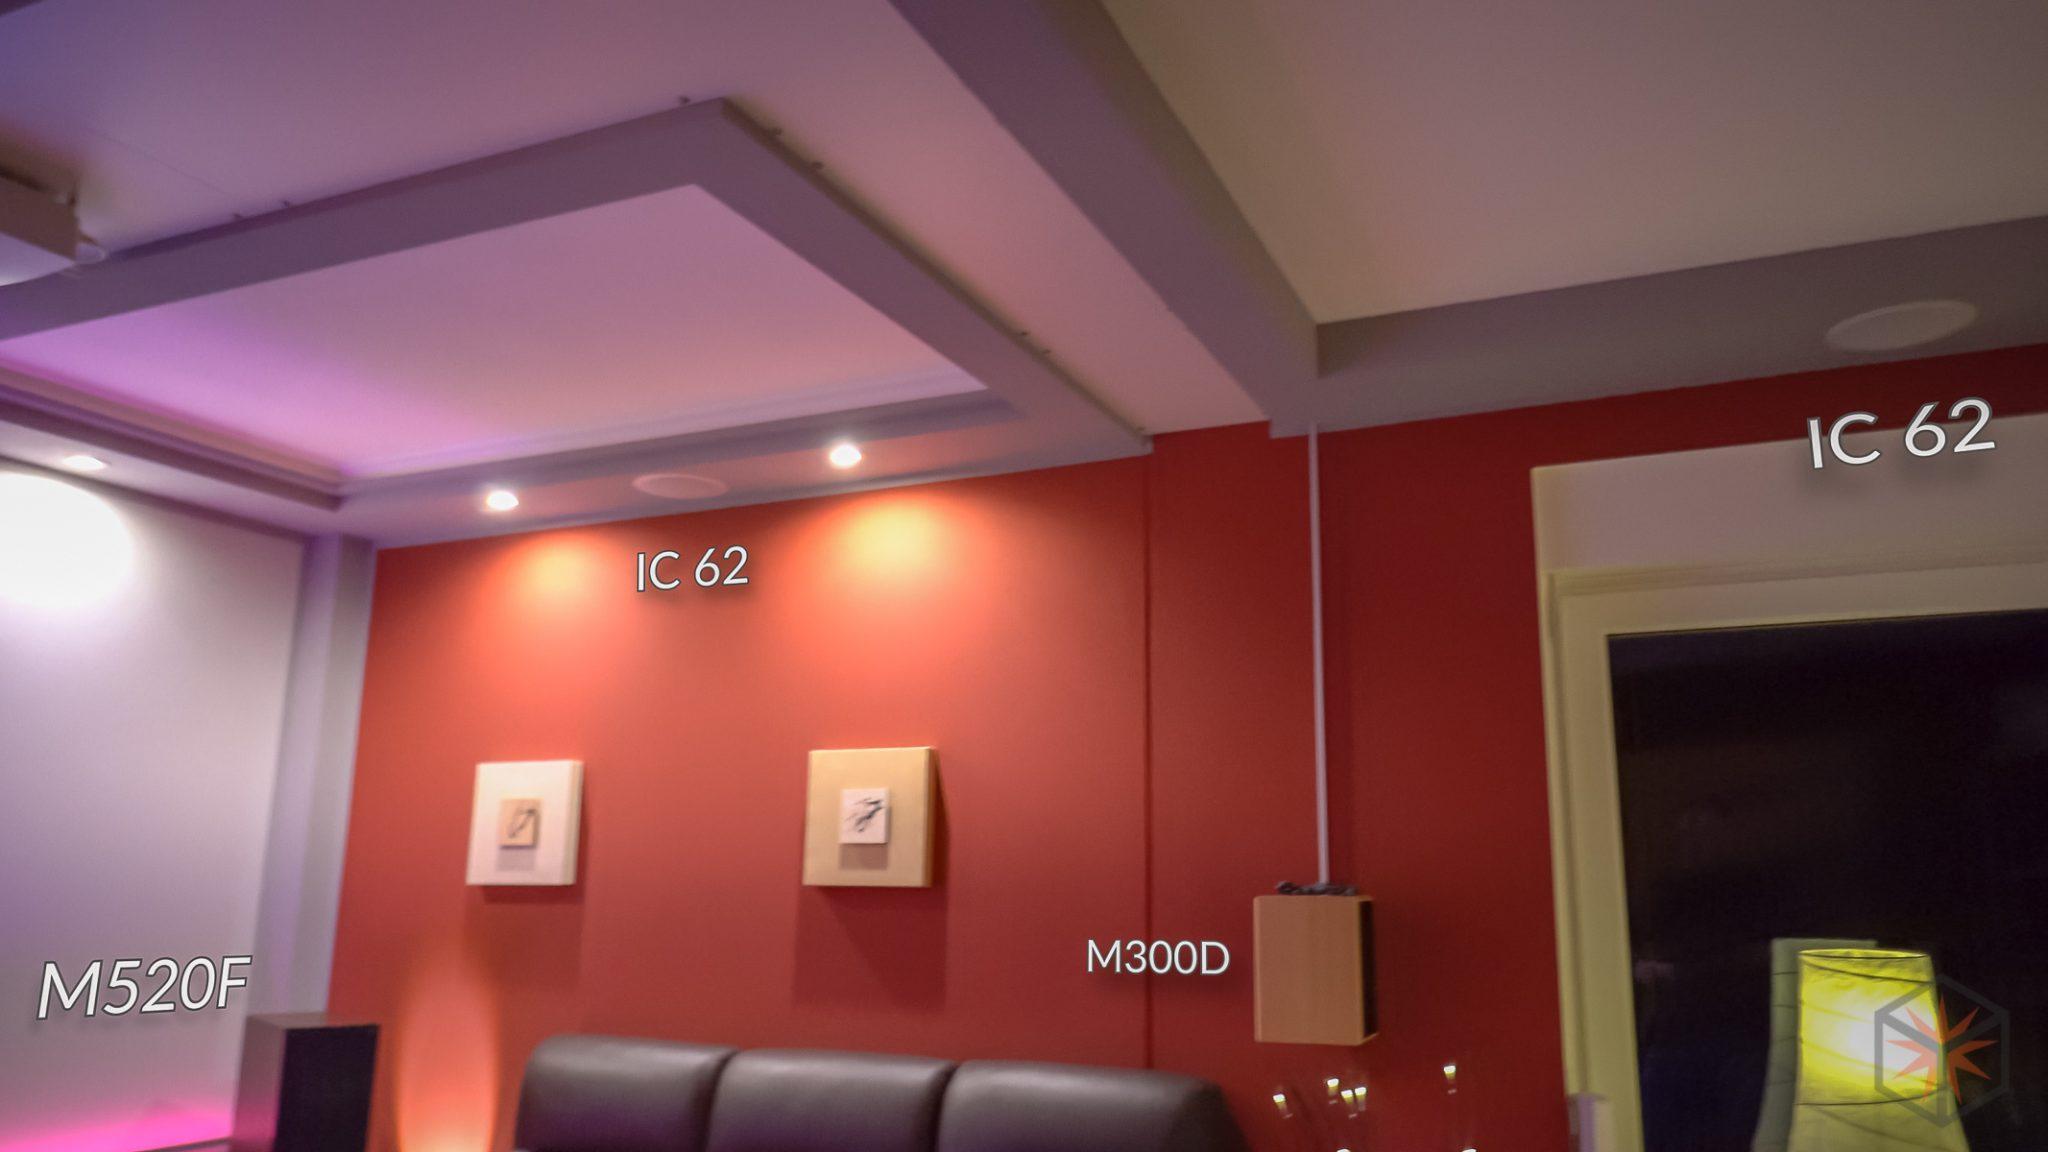 Atmos Height Speaker (IC 62)